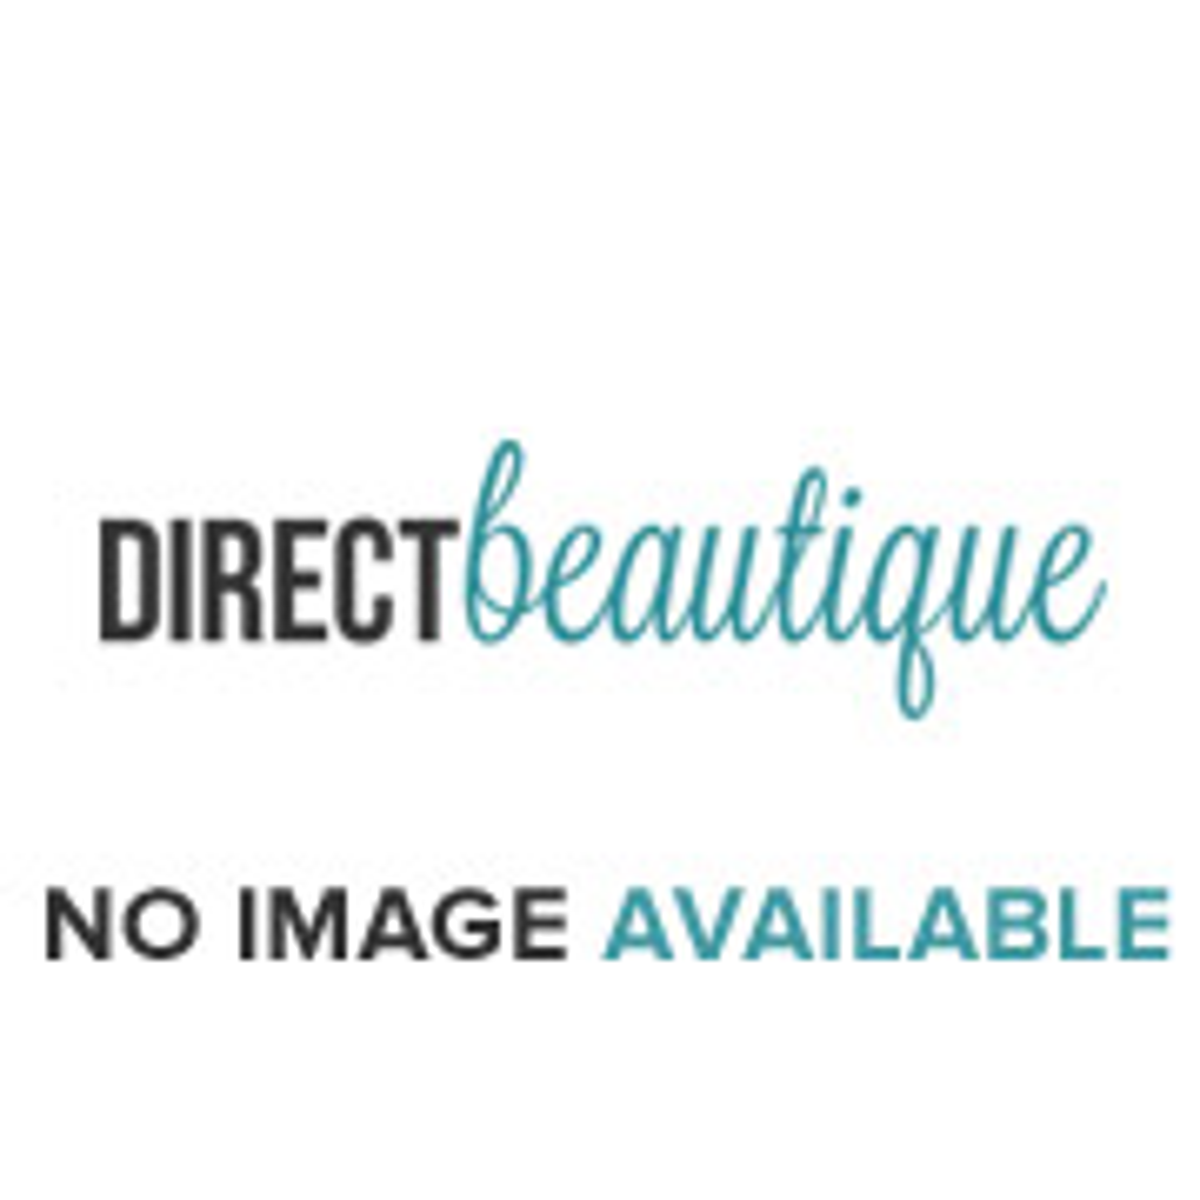 Victoria's Secret Victorias Secret Amber Romance Fragrance Mist 250ml - New Packaging